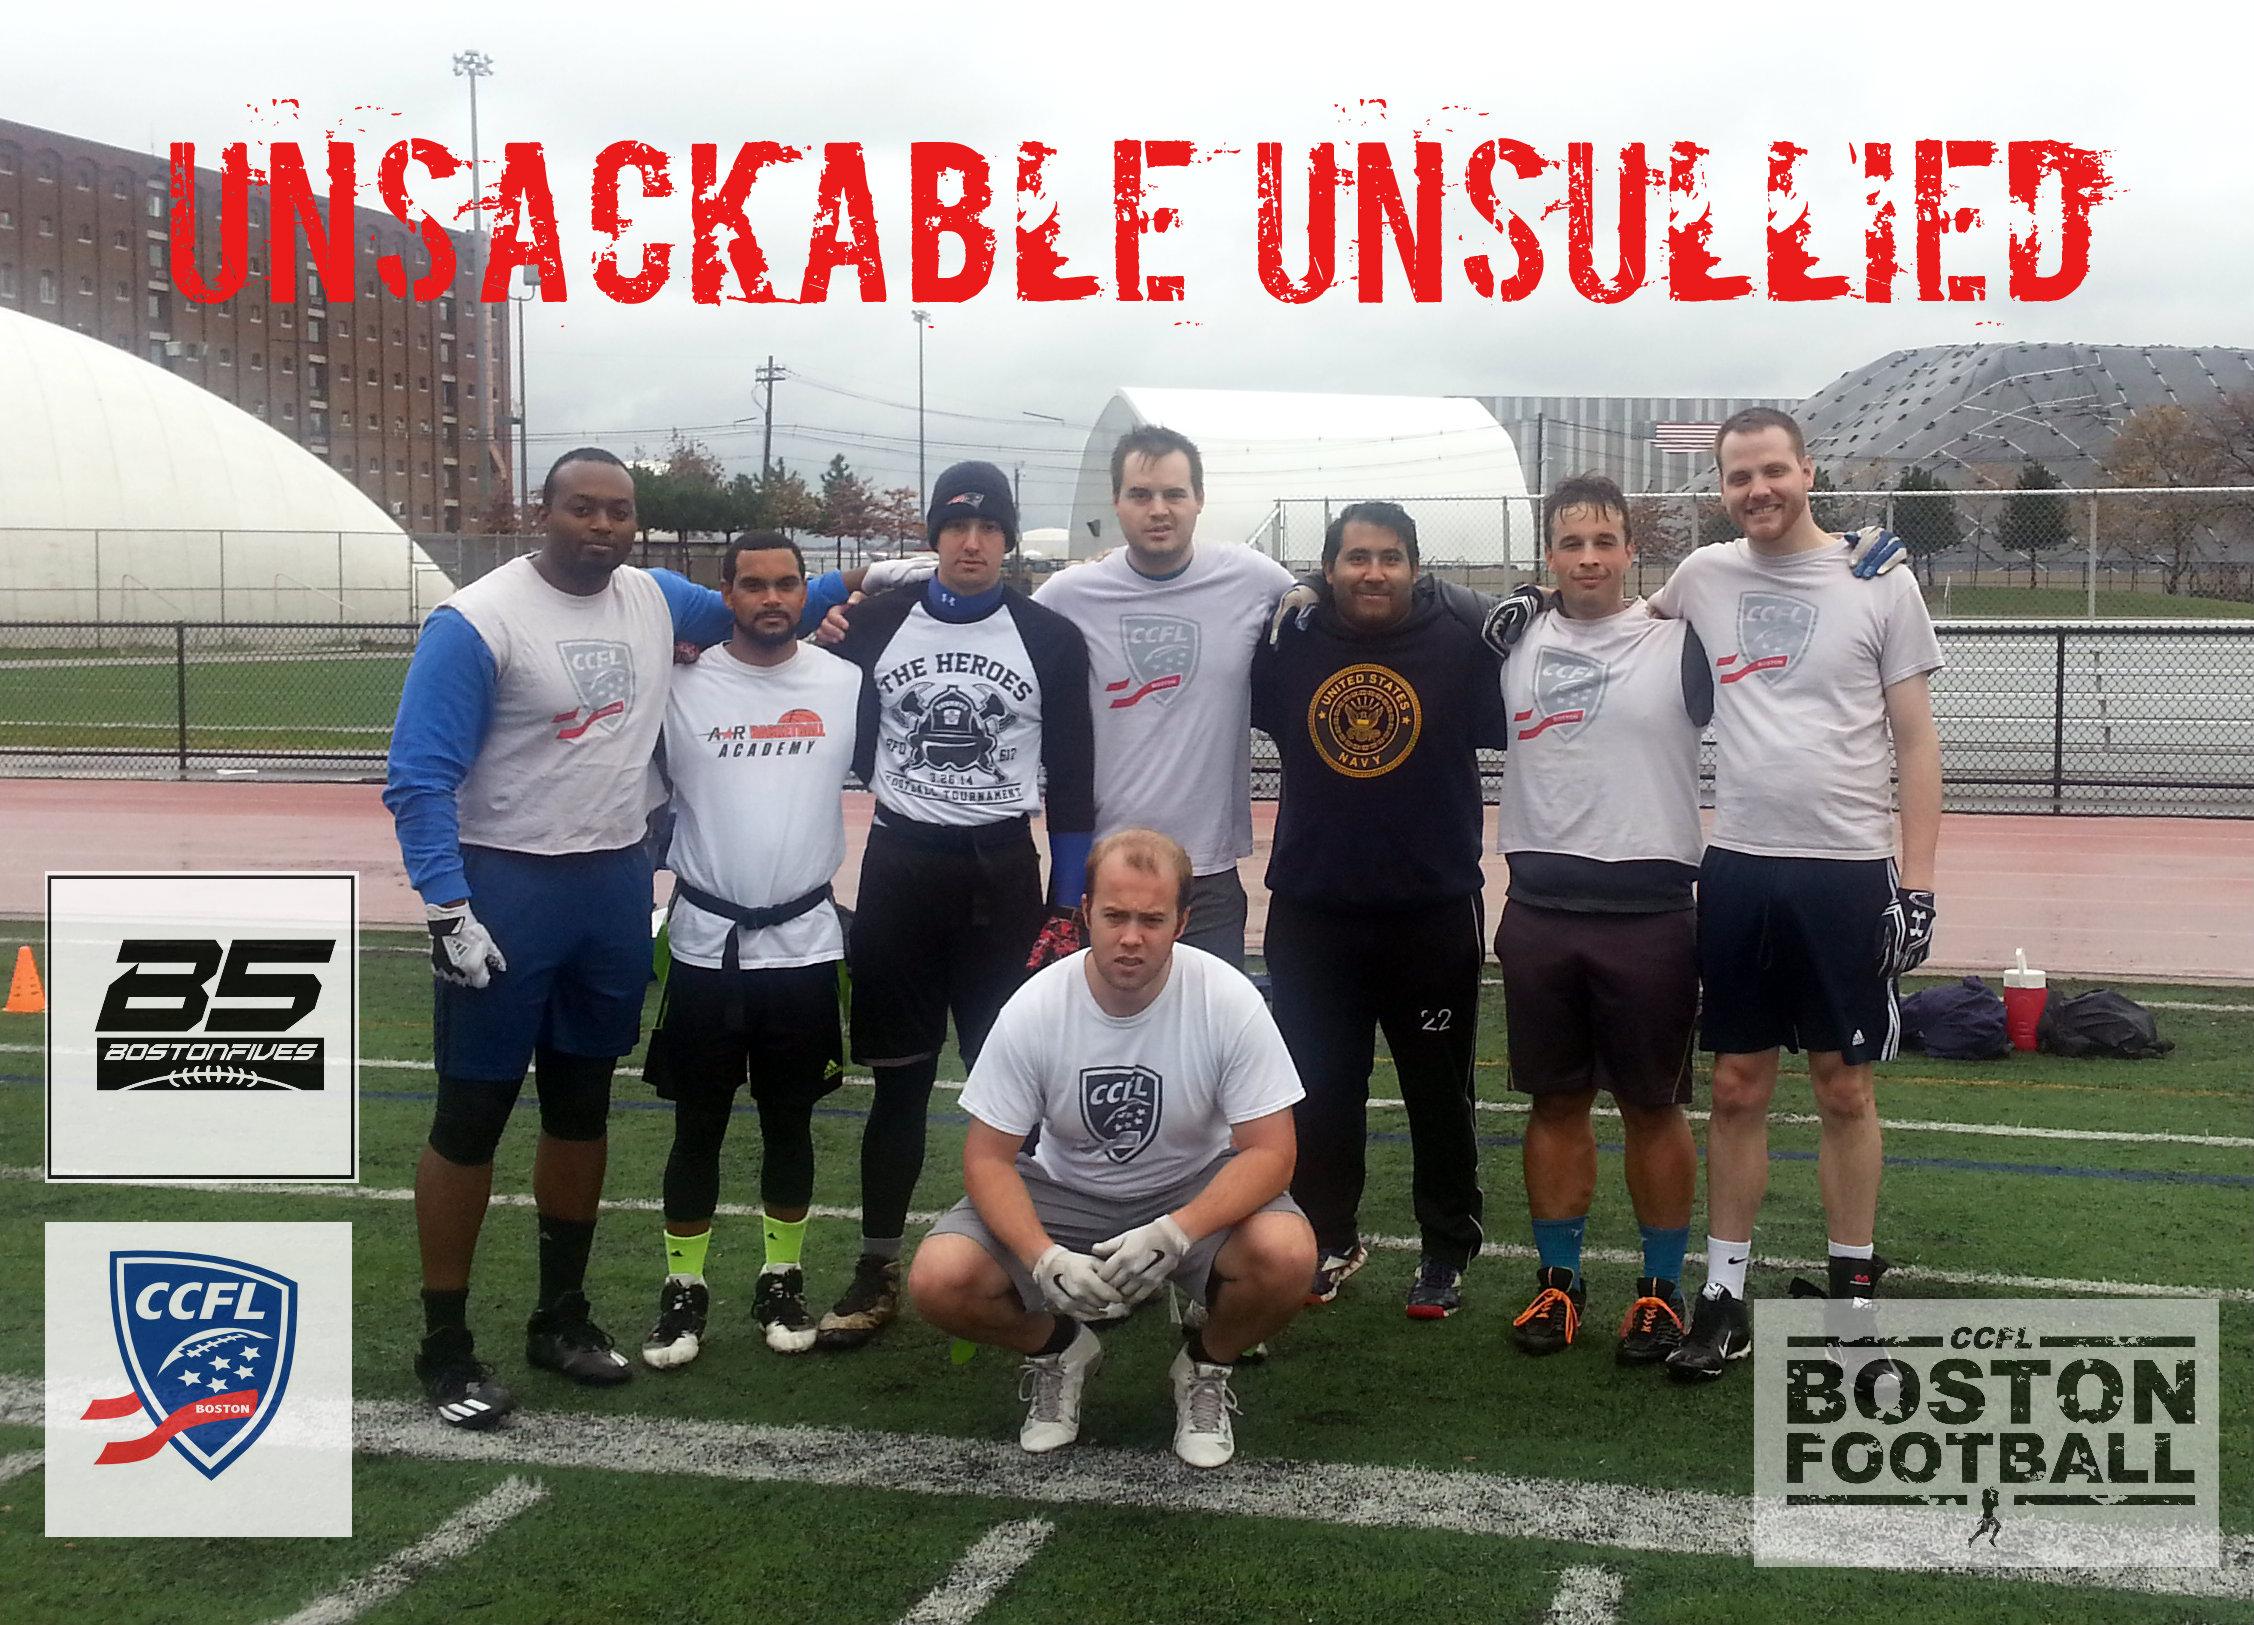 UnsackableUnsullied